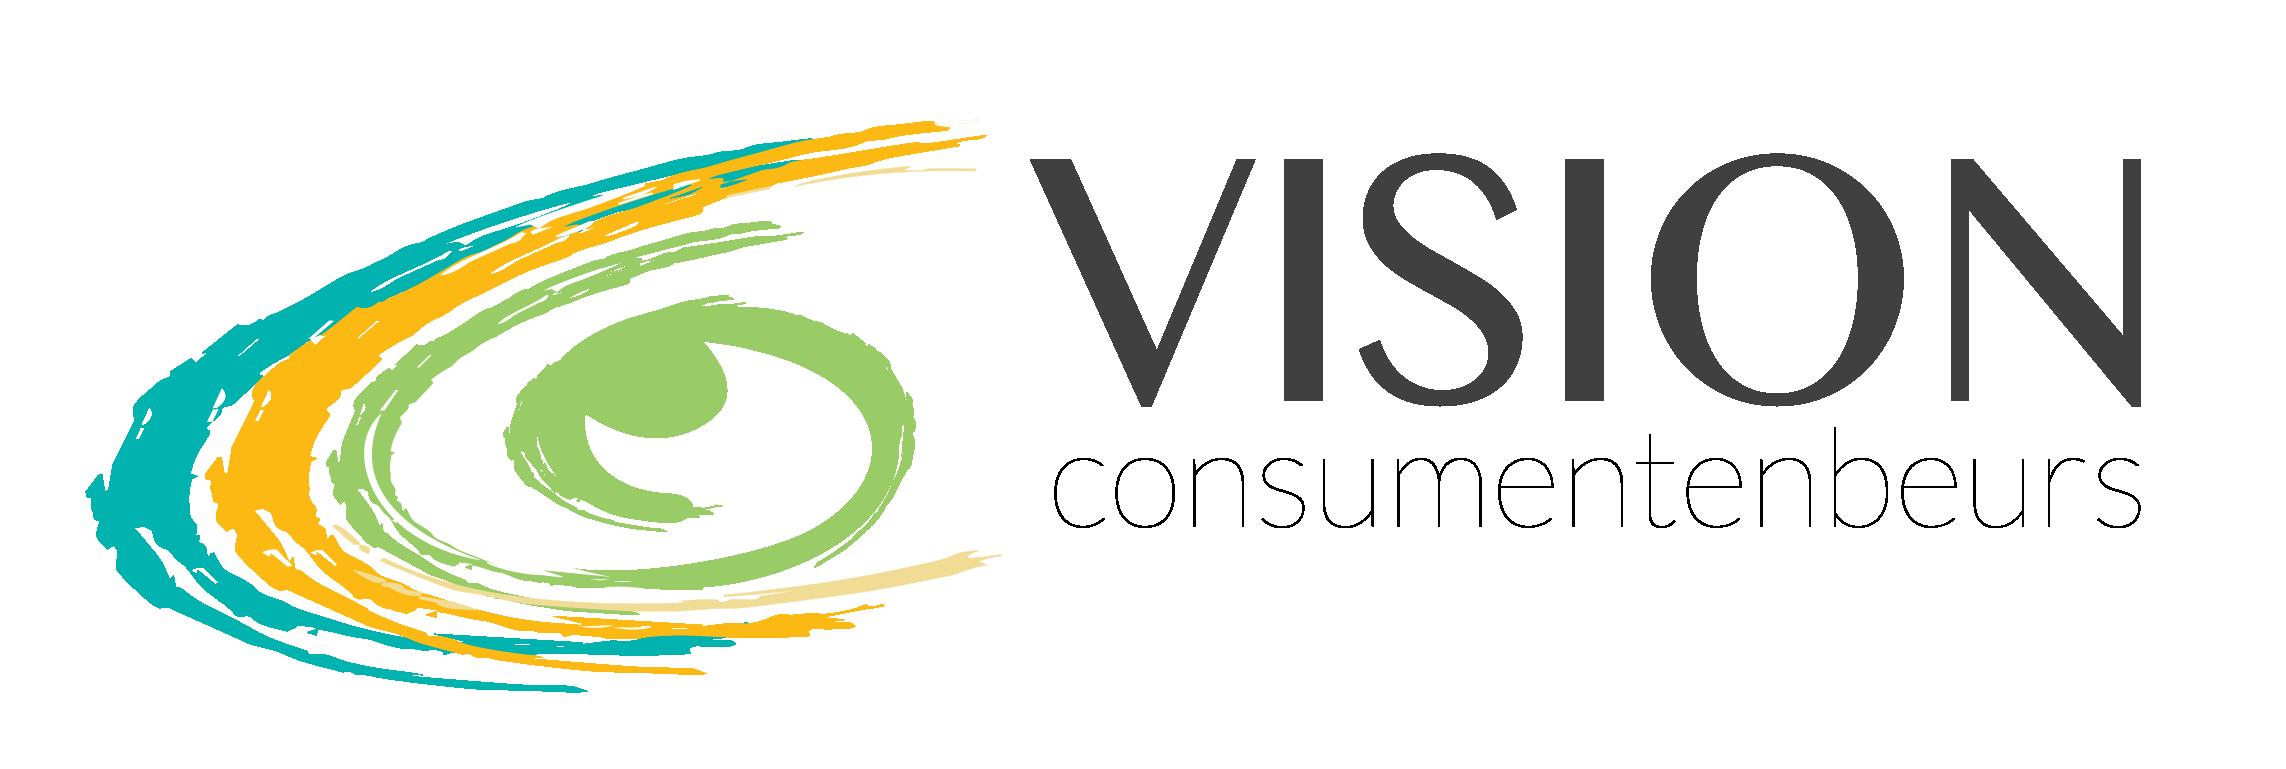 Vision consumentenbeurs